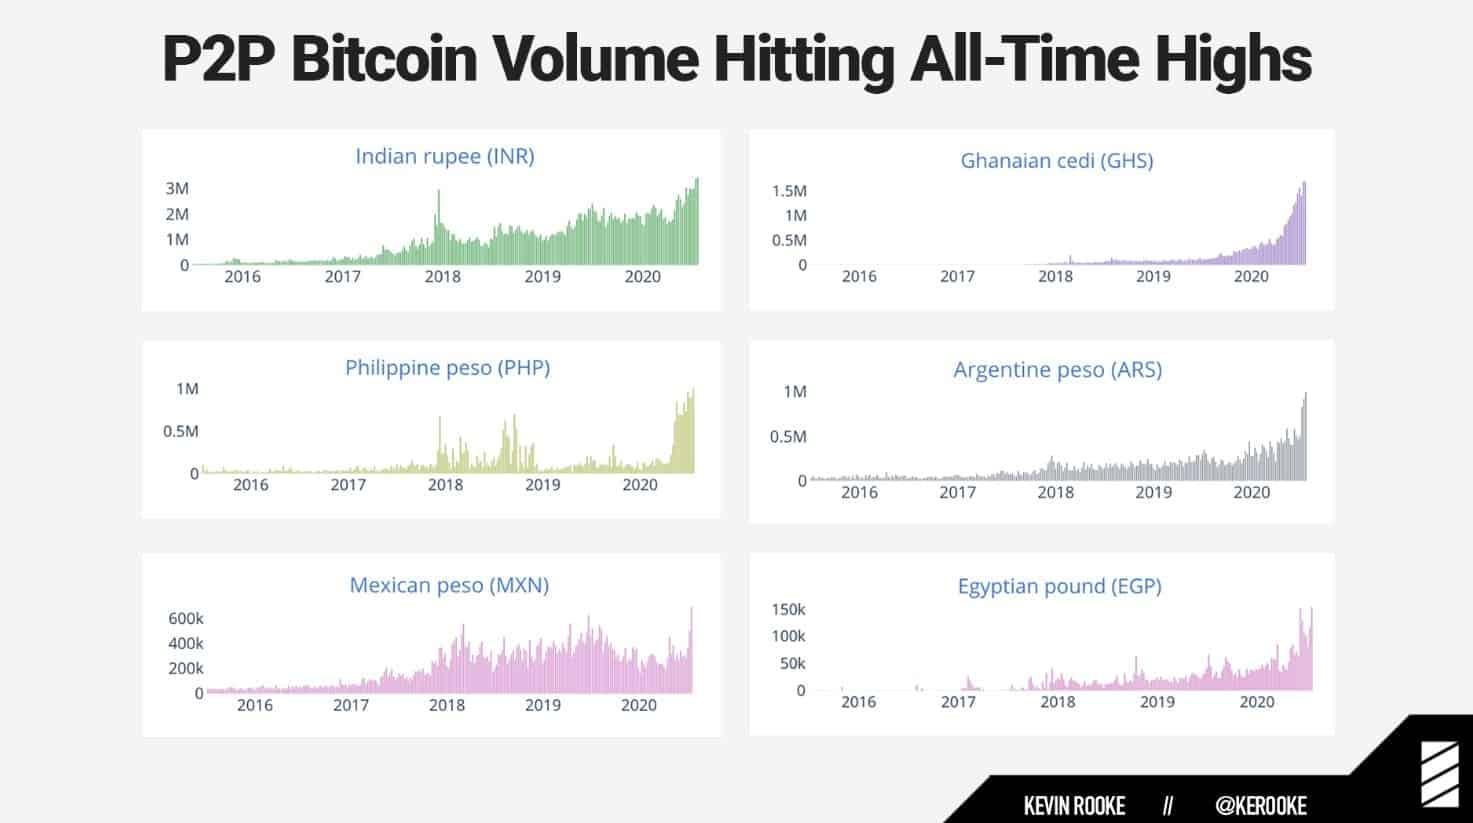 bitcoin p2p volume